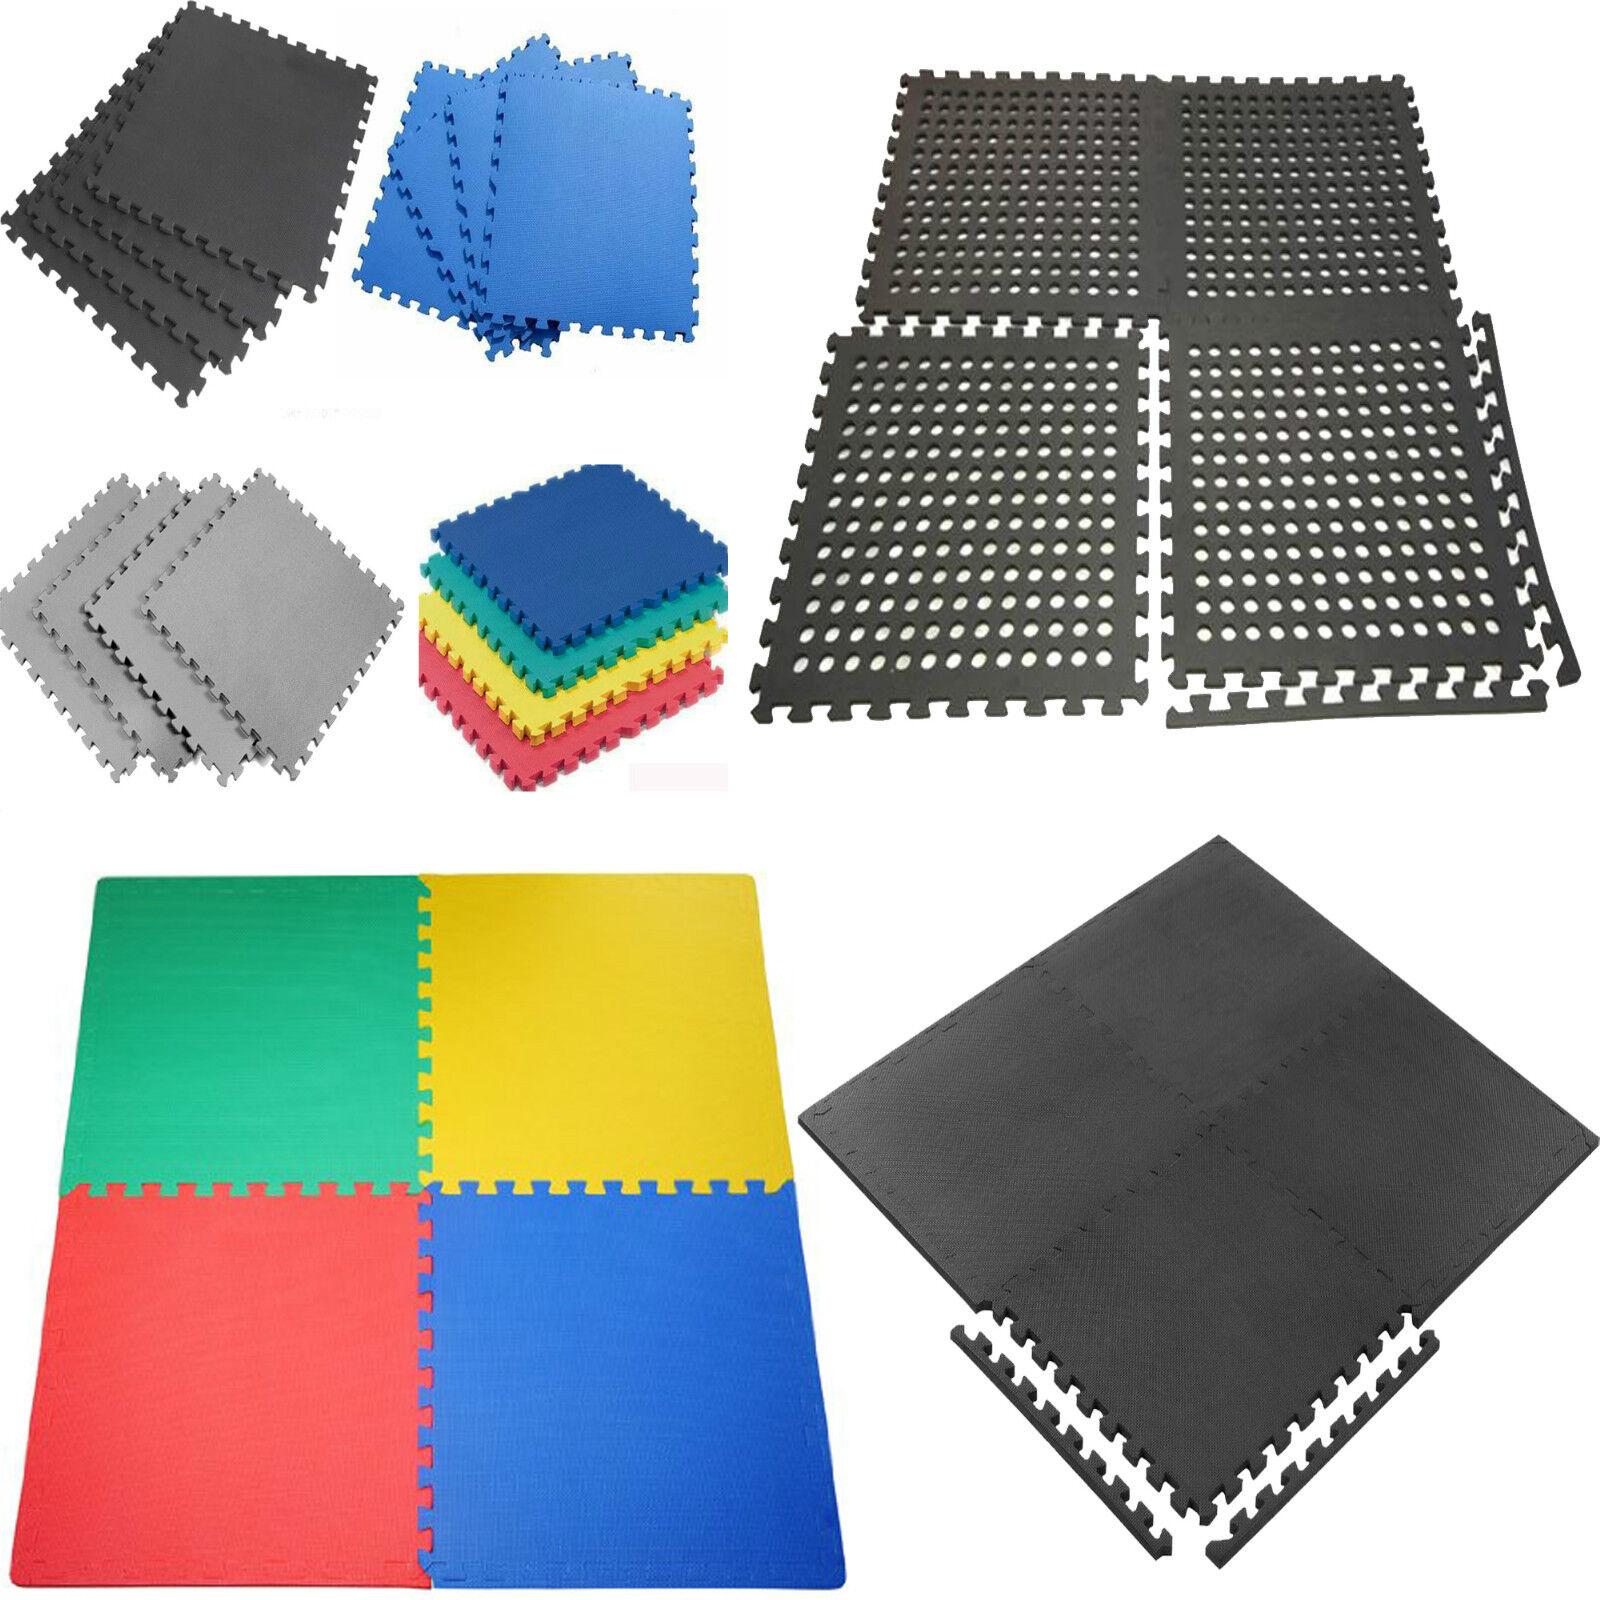 eva interlocking soft mats floor gym office garage foam kids play tiles w edges. Black Bedroom Furniture Sets. Home Design Ideas